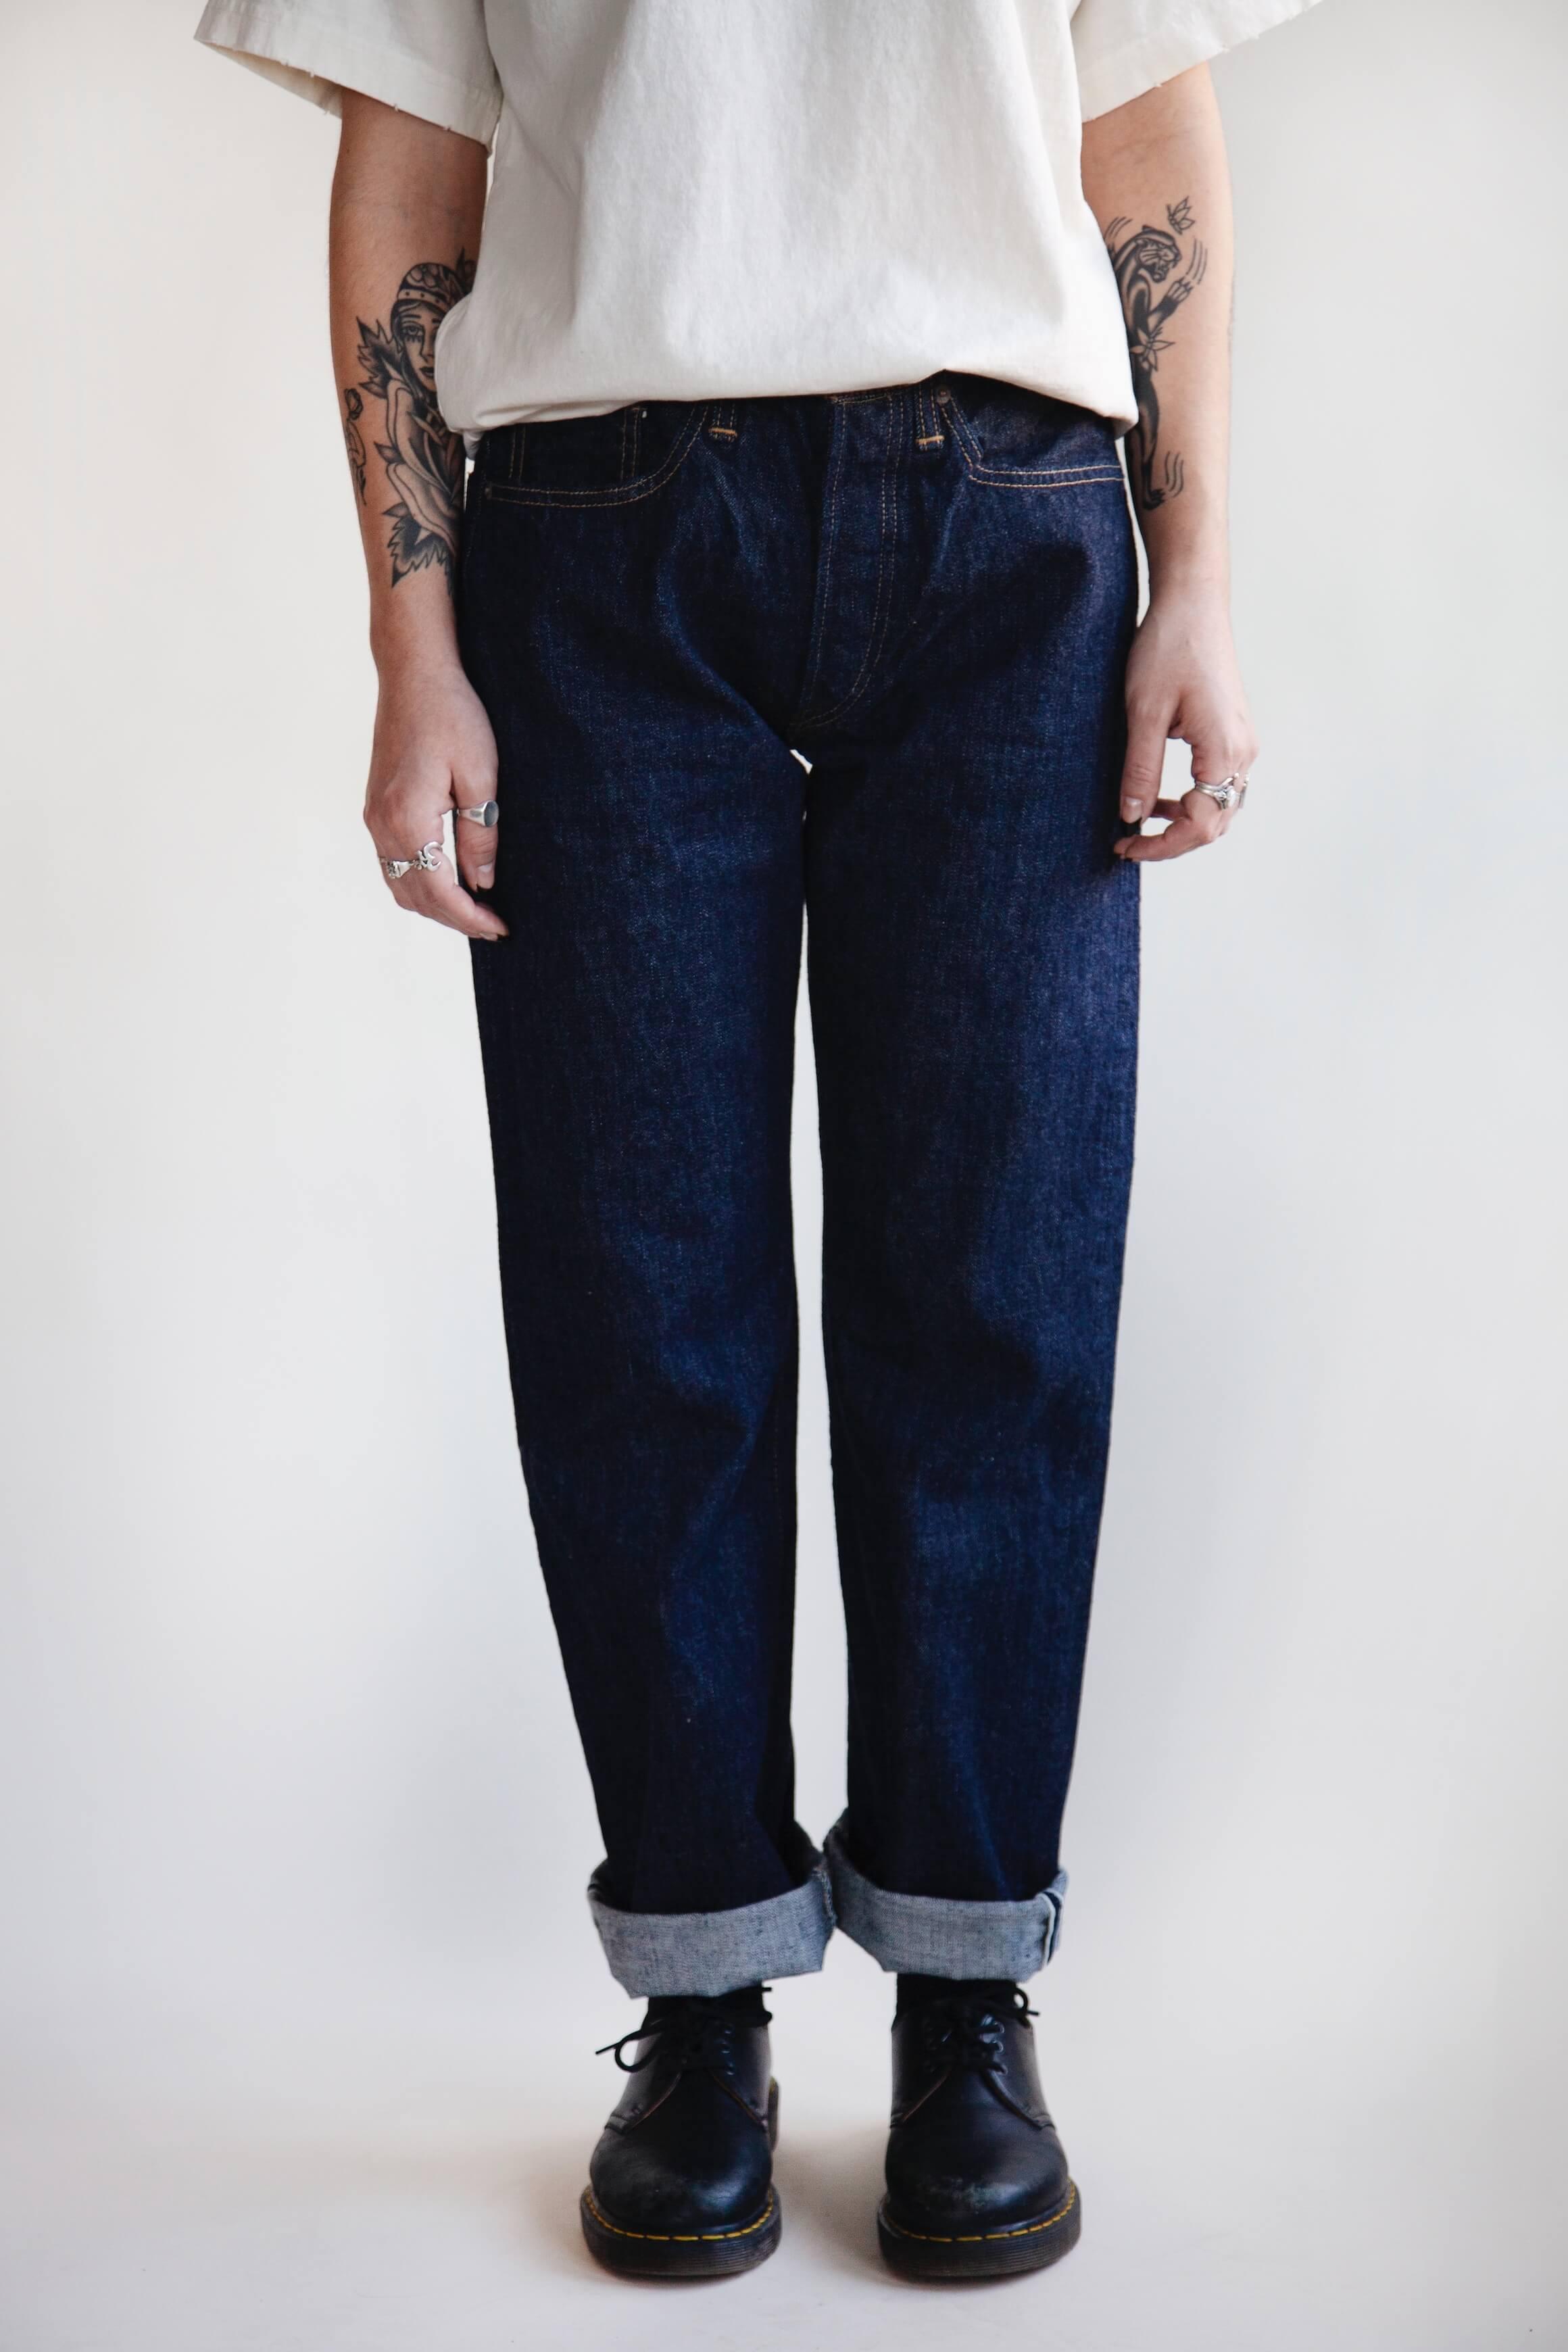 orslow 105 Standard Denim - One Wash on female model